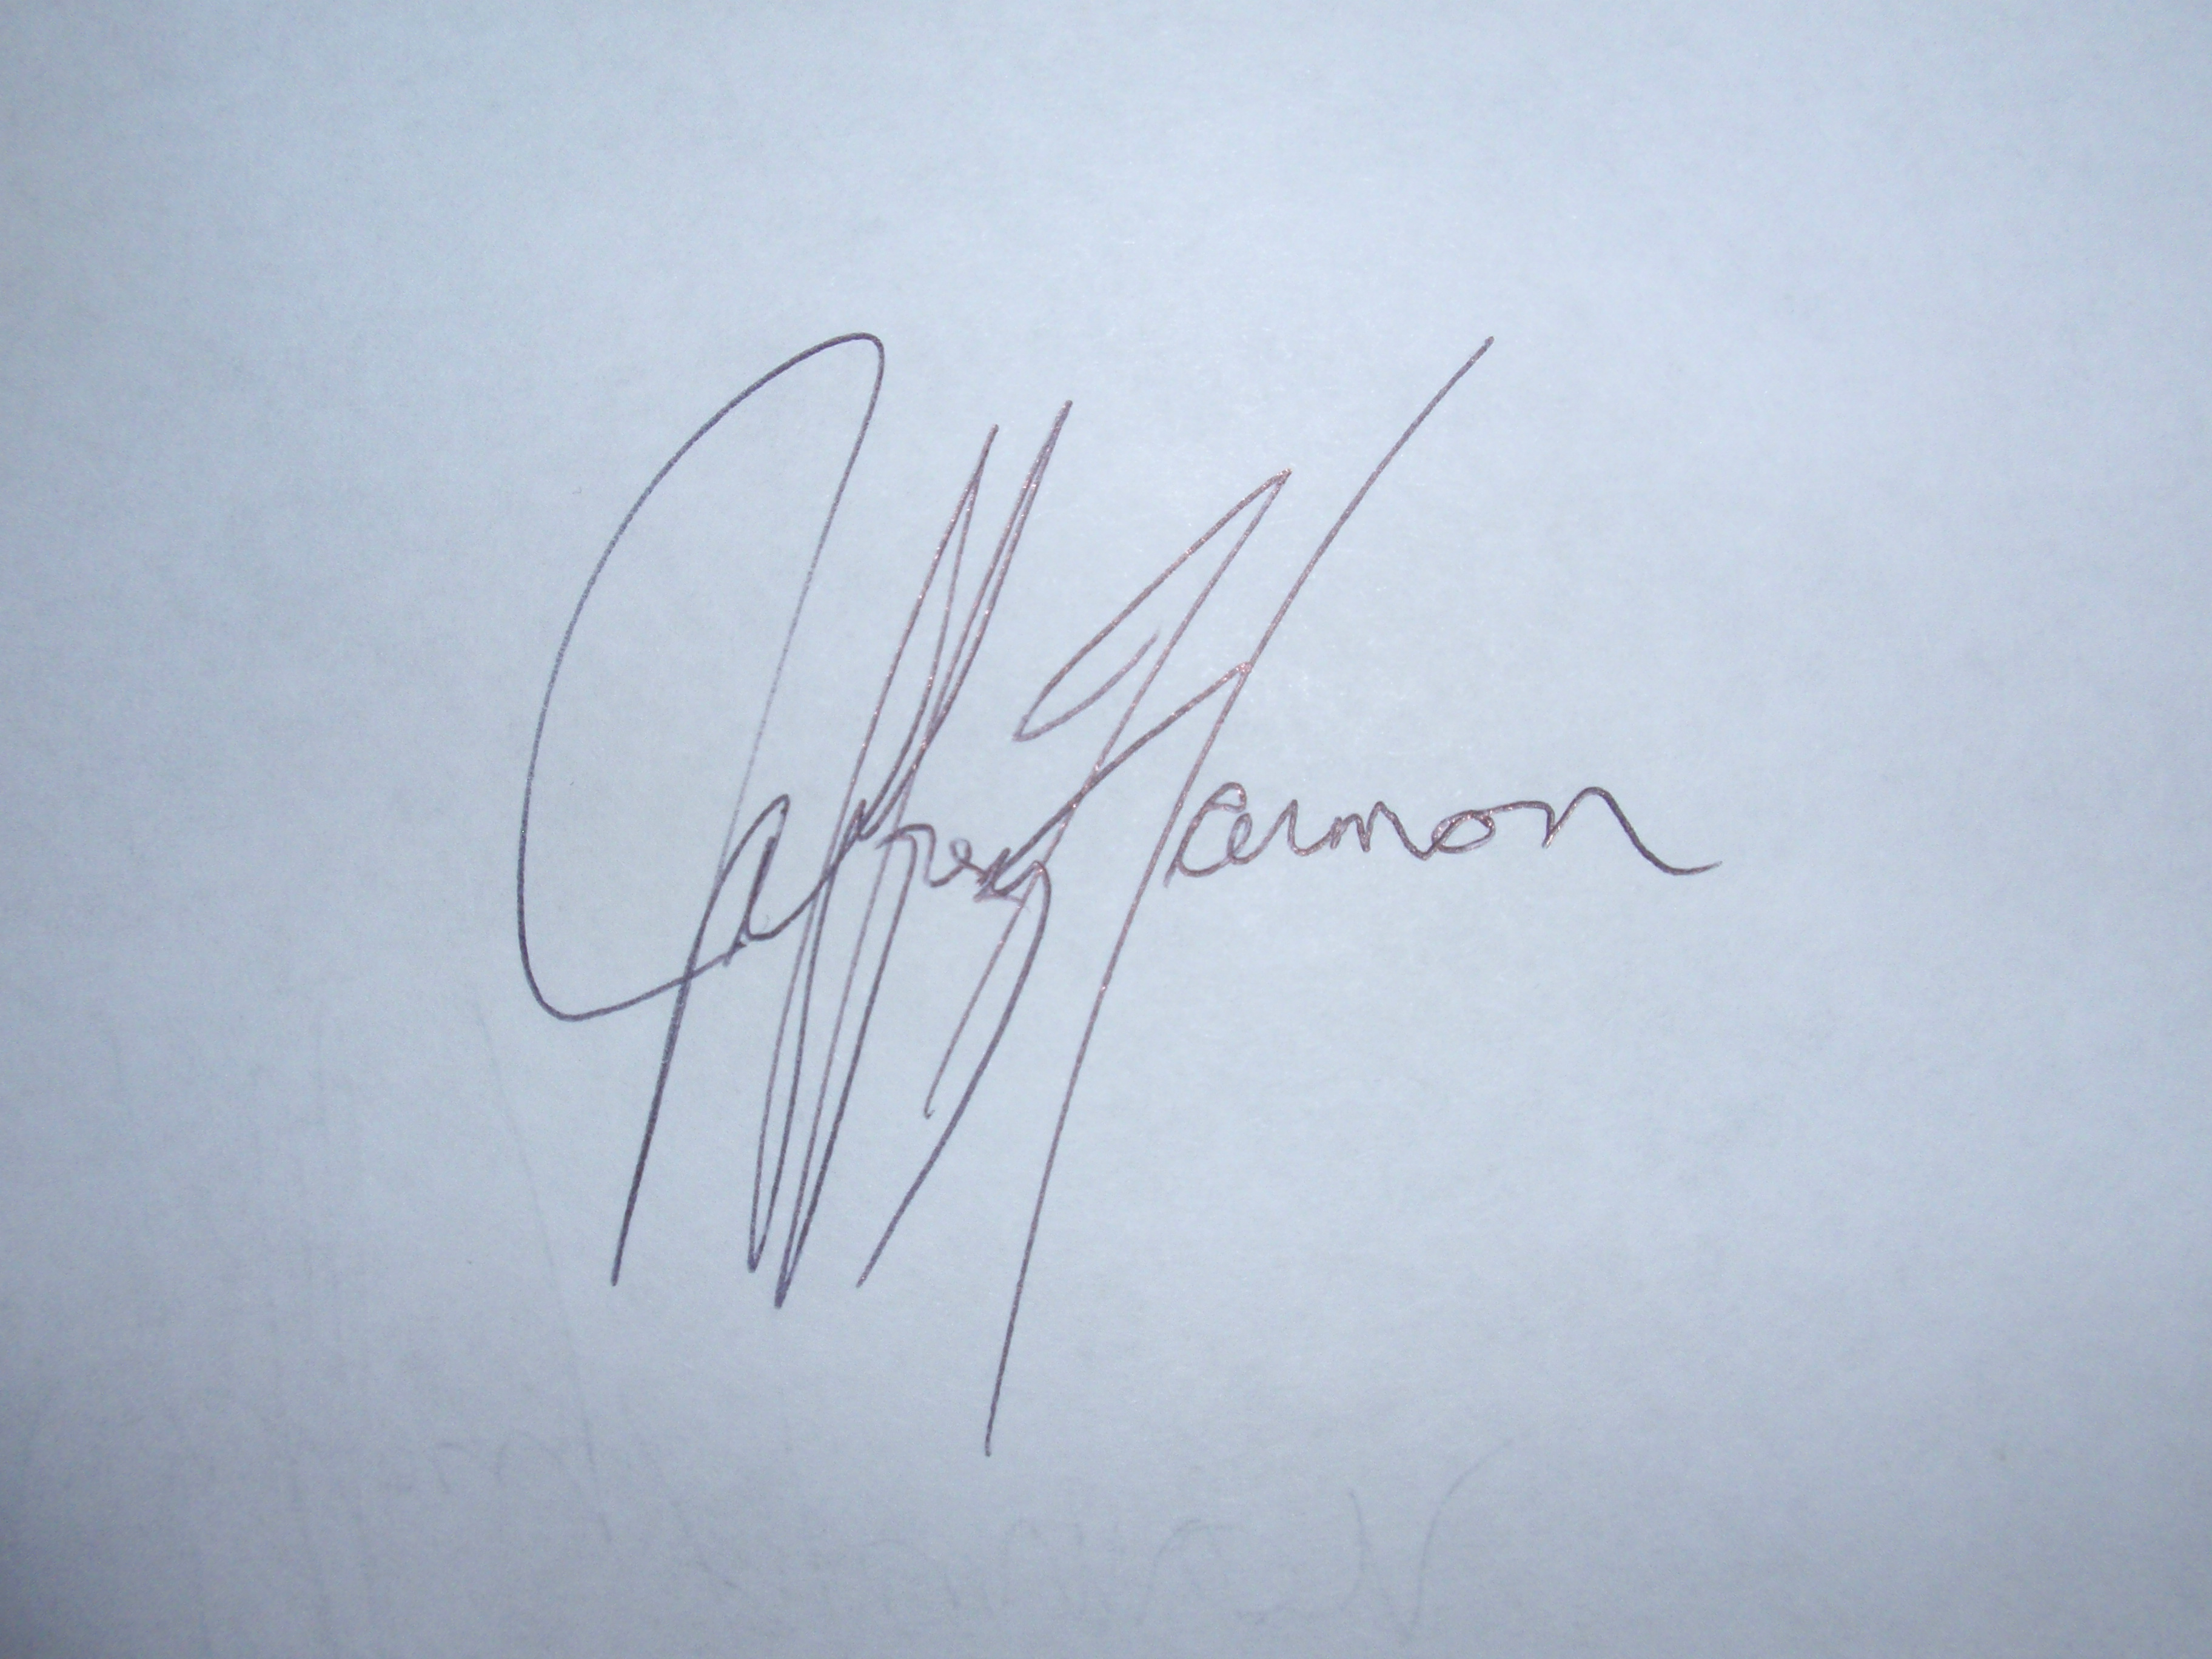 Jeffrey Harmon's Signature